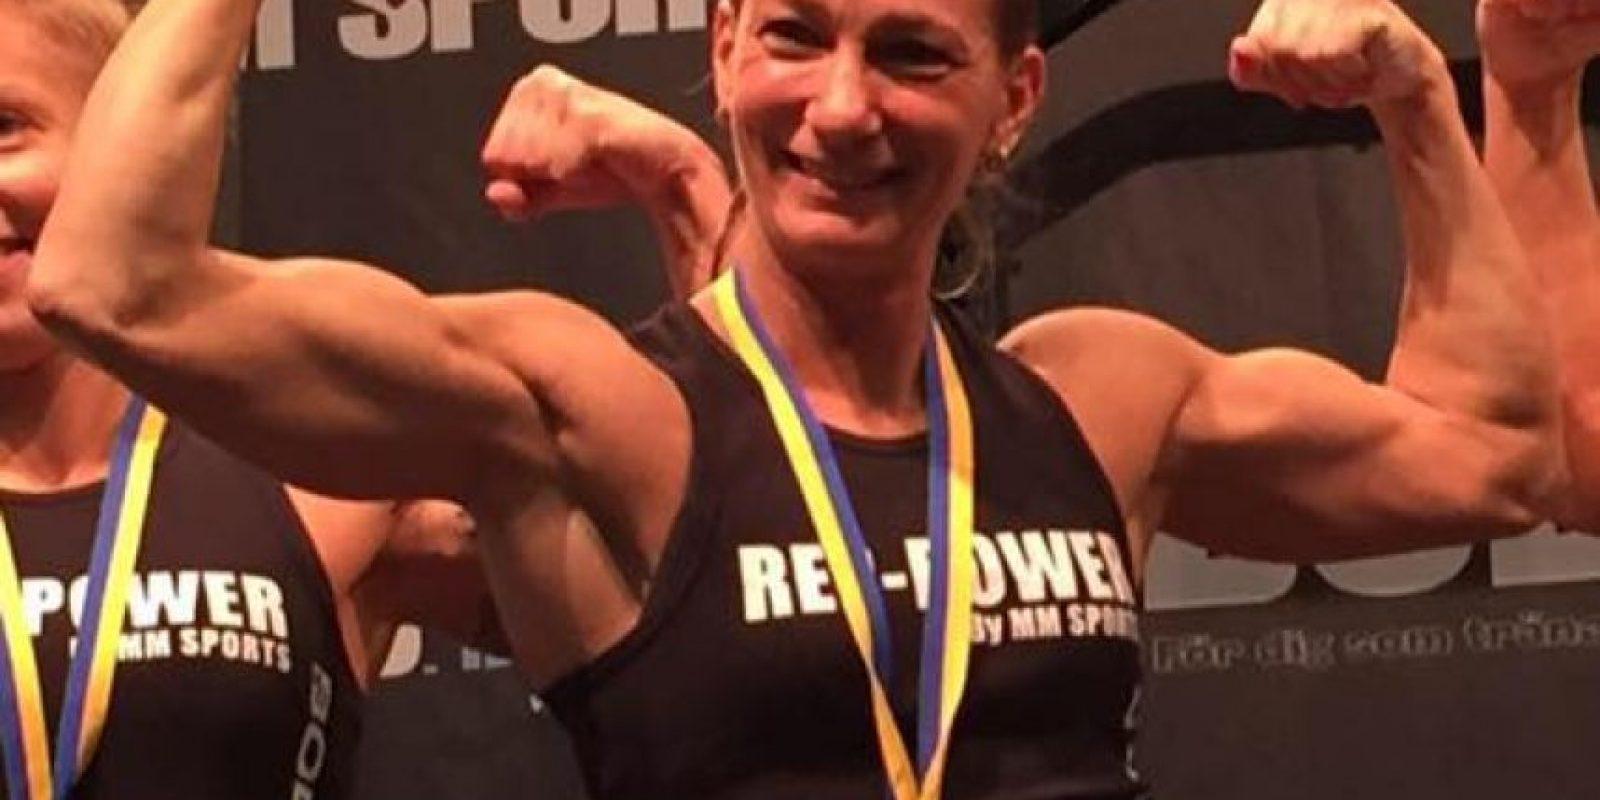 Mikaela Kellner es una reconocida atleta Foto:facebook.com/mi.kel.5055